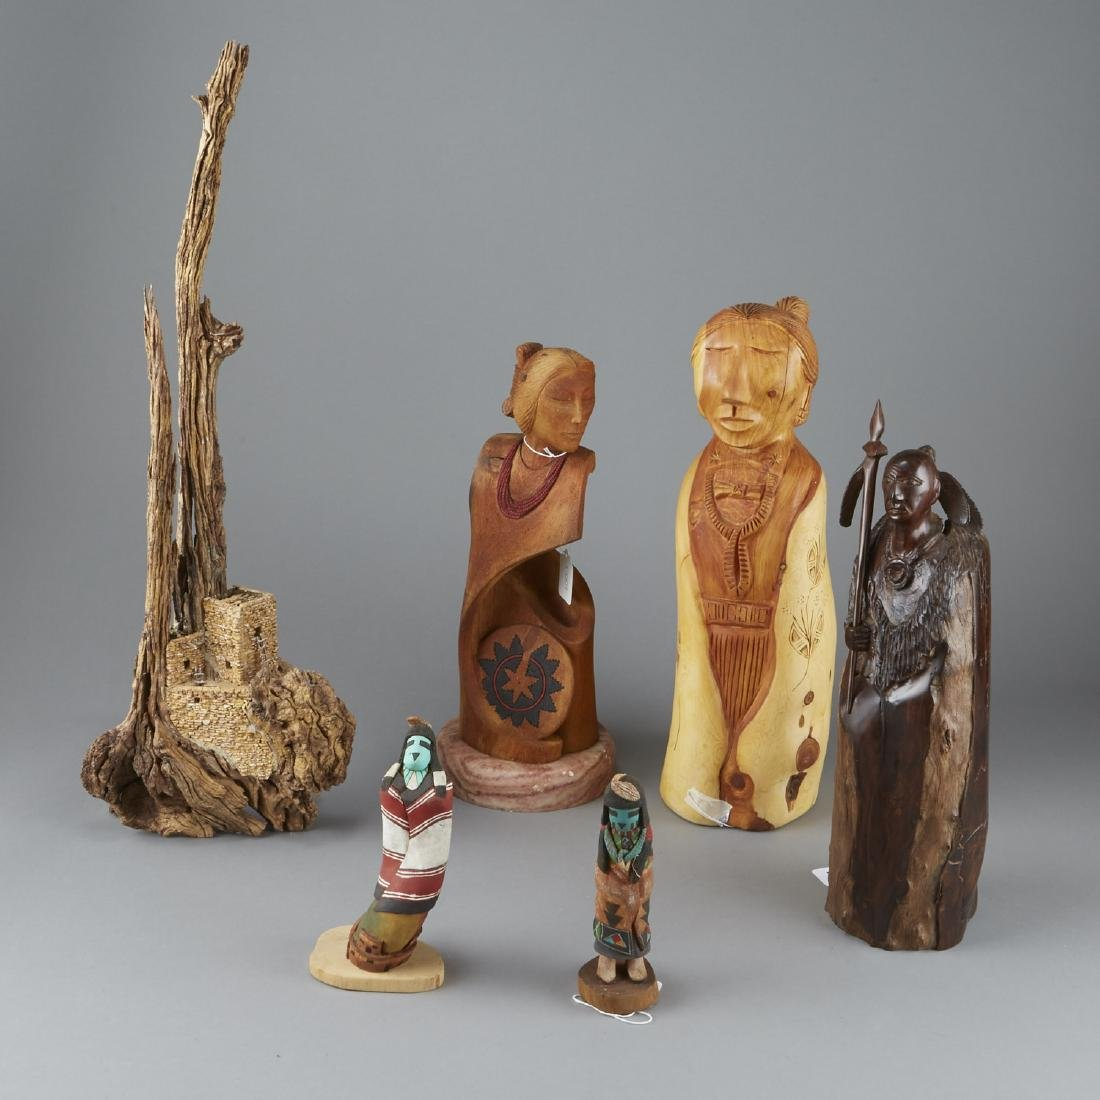 6 Carved Wood Sculptures Native American Pueblo